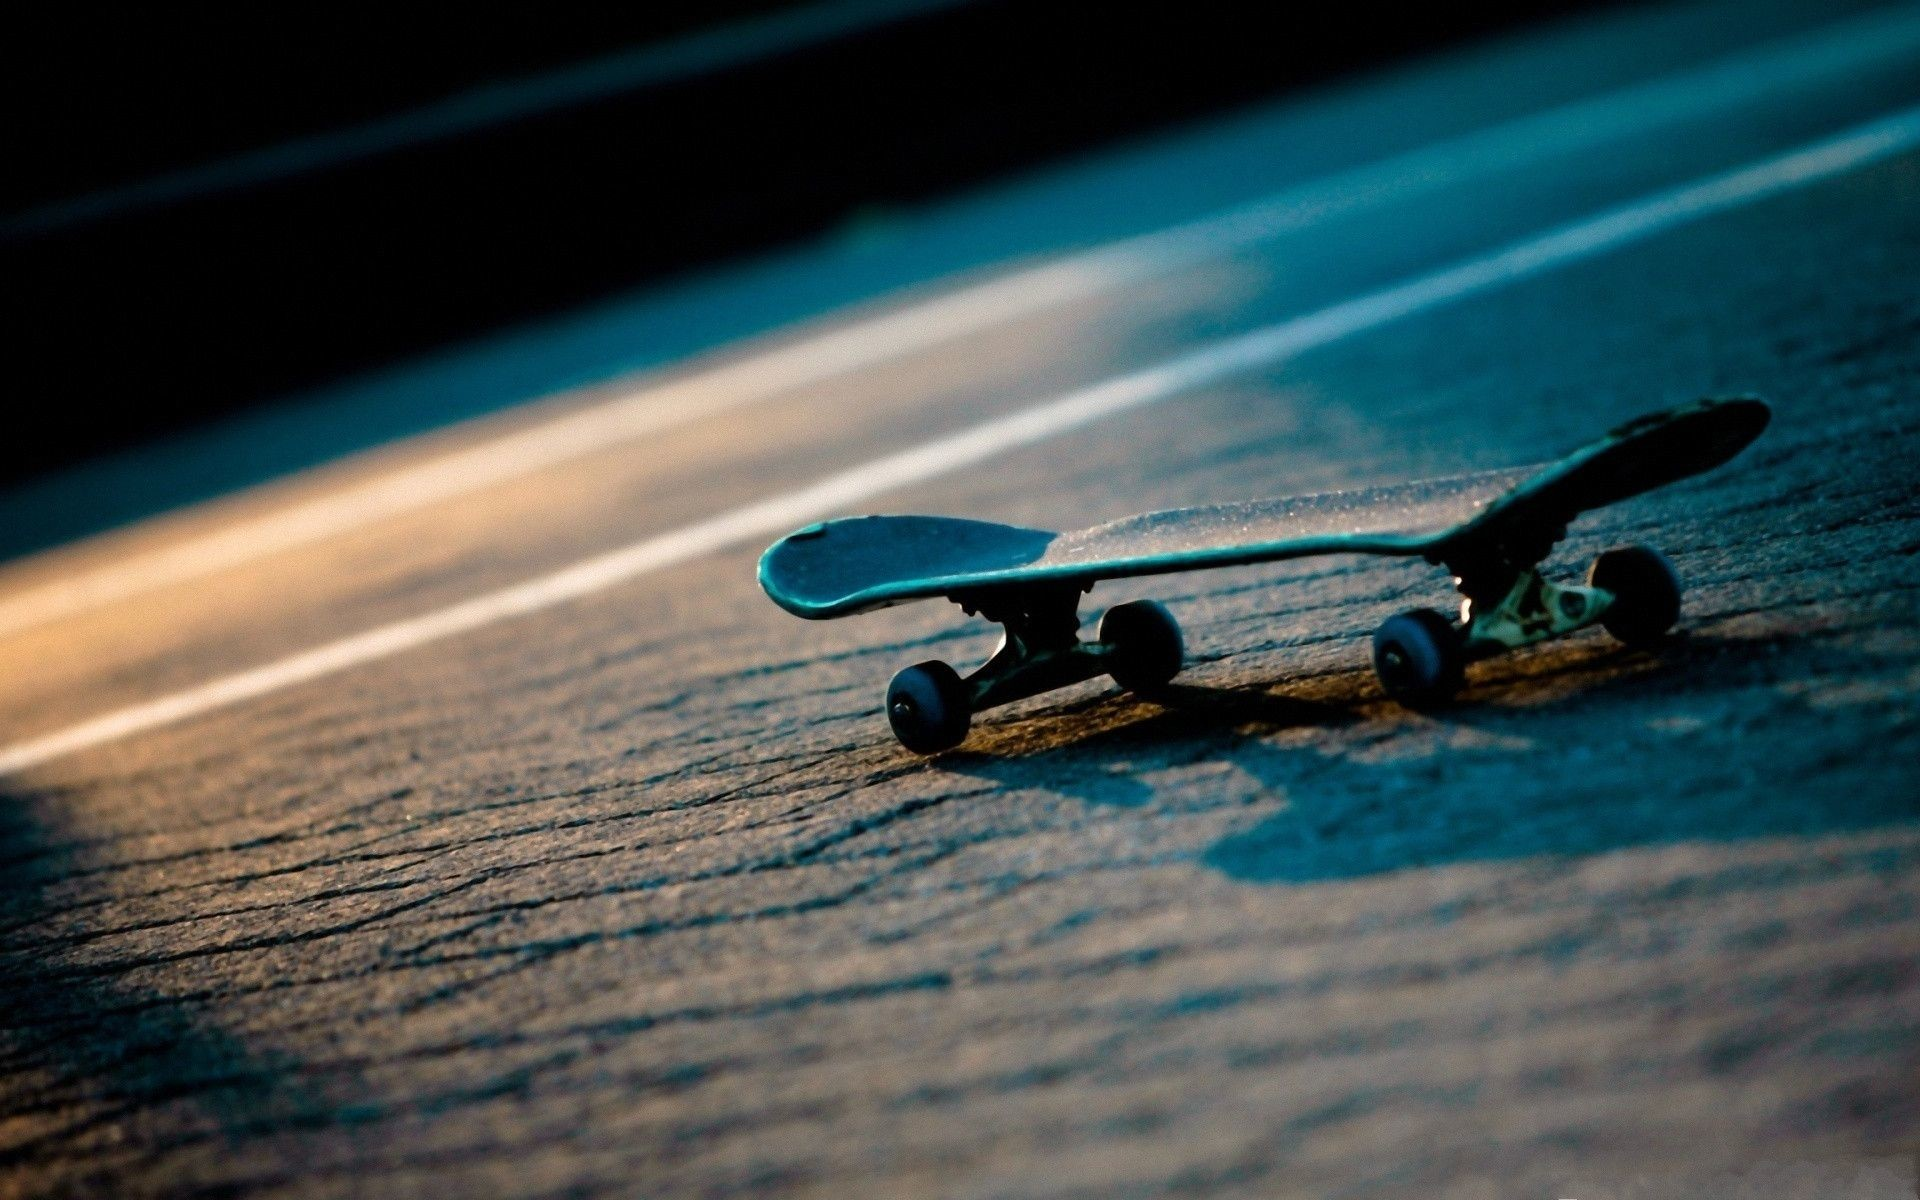 Coole Skateboards